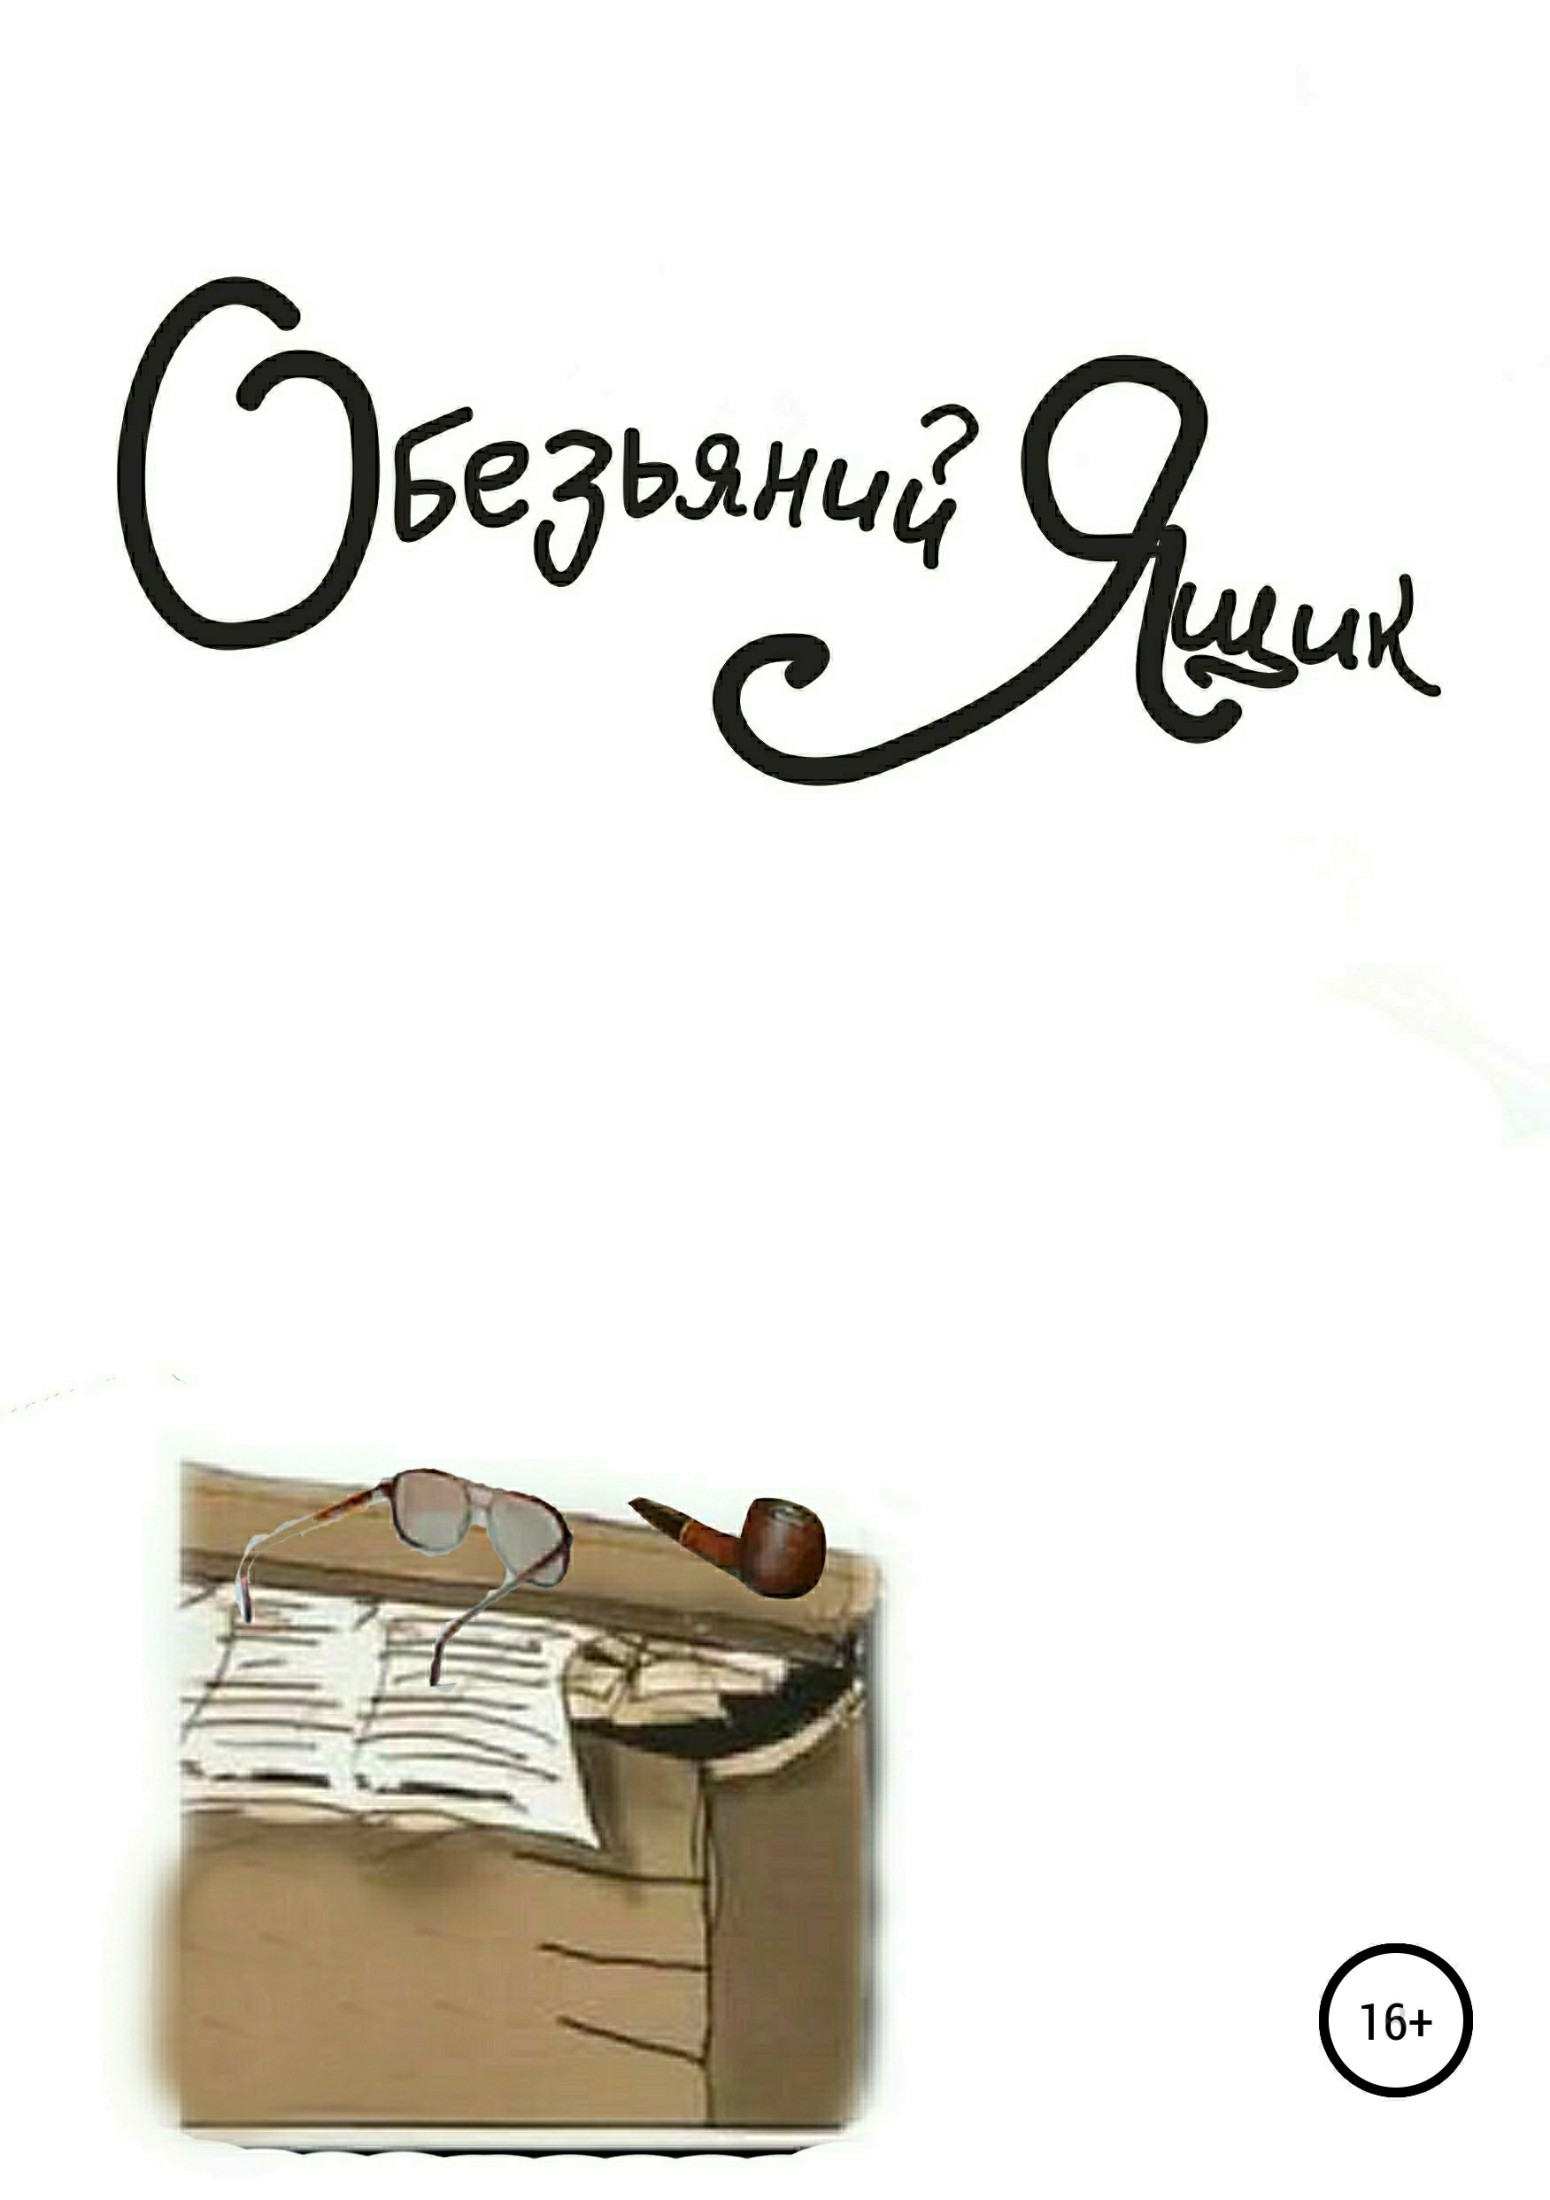 Василий Пригодич. Обезьяний ящик